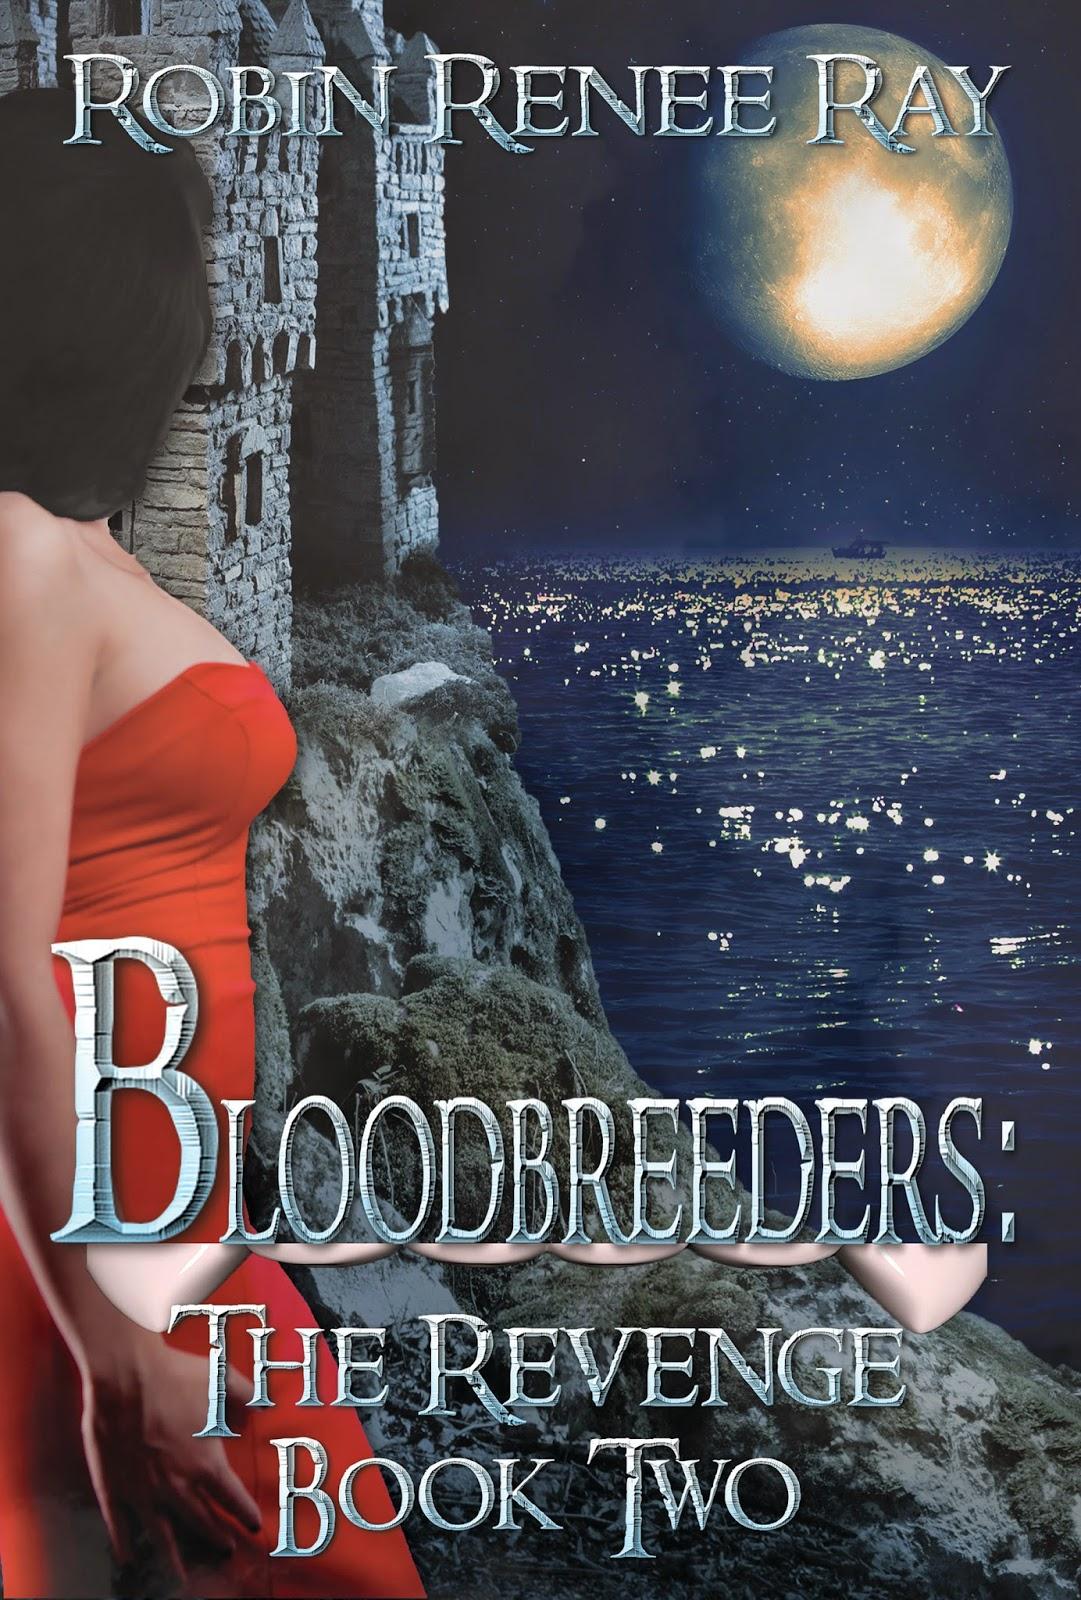 http://www.amazon.com/Bloodbreeders-Revenge-Robin-Renee-Ray-ebook/dp/B00GLAVJLW/ref=pd_sim_kstore_1?ie=UTF8&refRID=1GDR61C2TEABKSMRQN1B